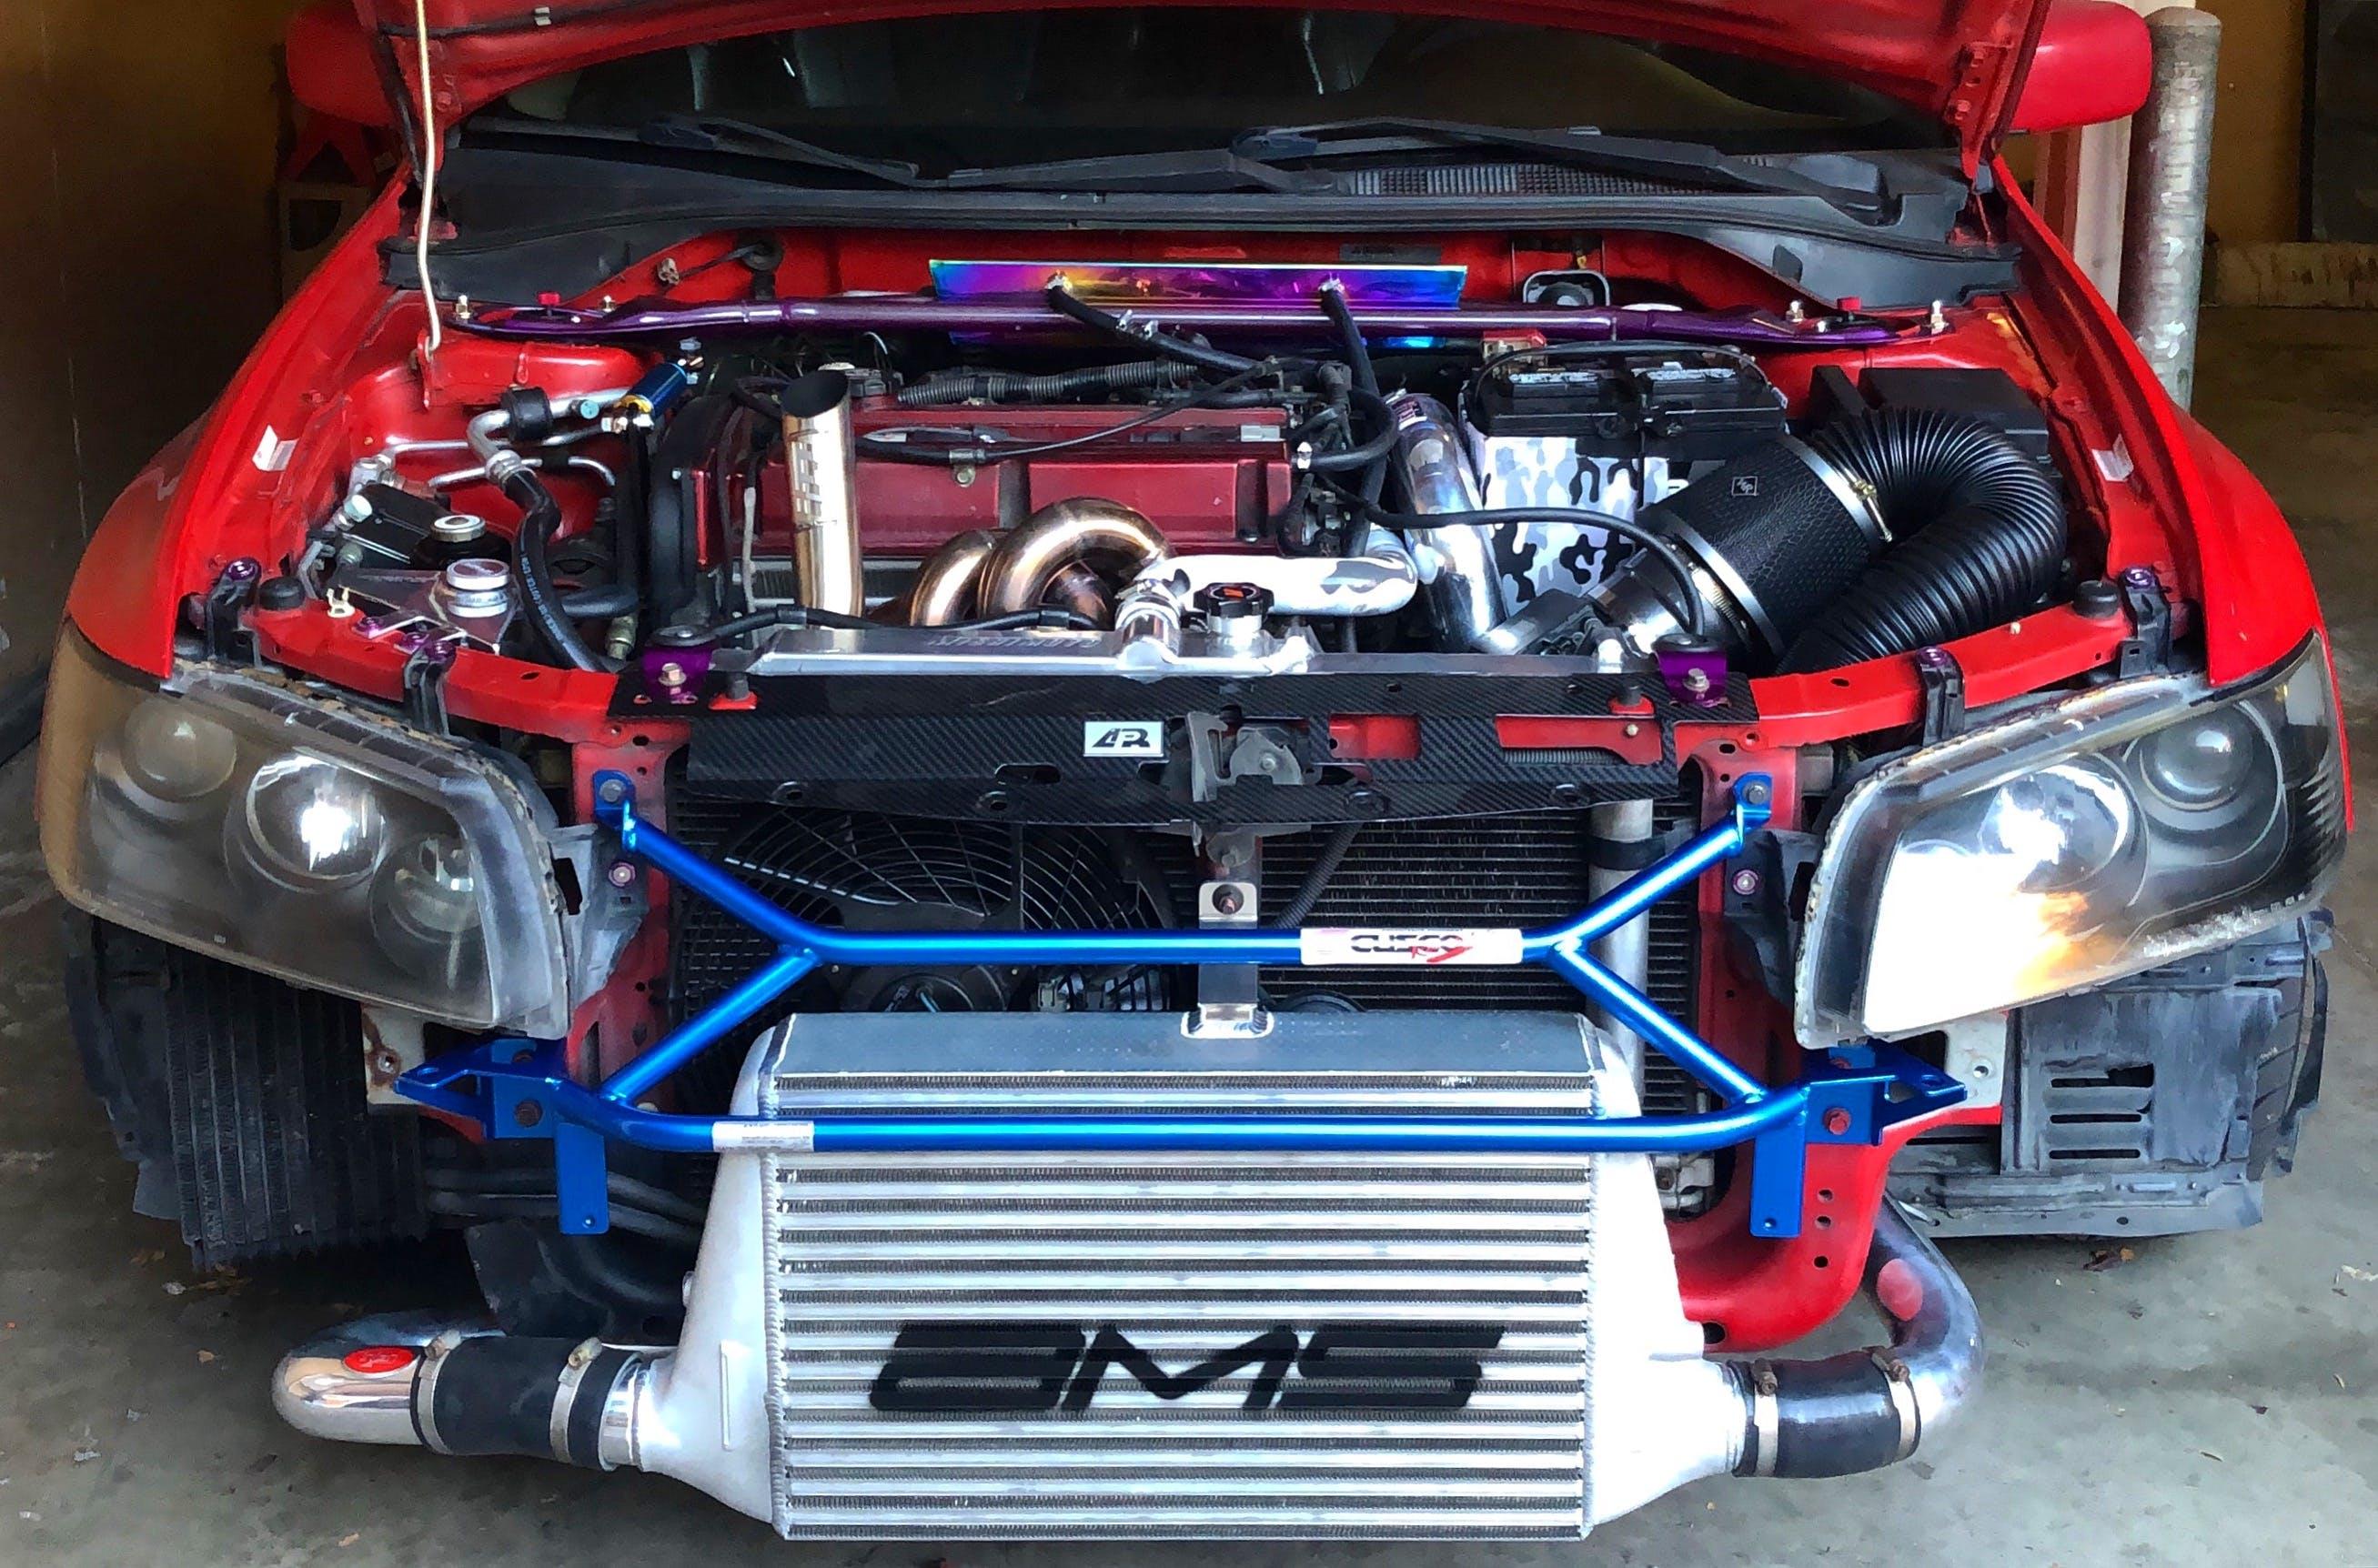 AMS Front Mount Intercooler w/ Logo | 2003-2007 Mitsubishi Evo 8 / 9 |  (AMS 01 09 0101-1)